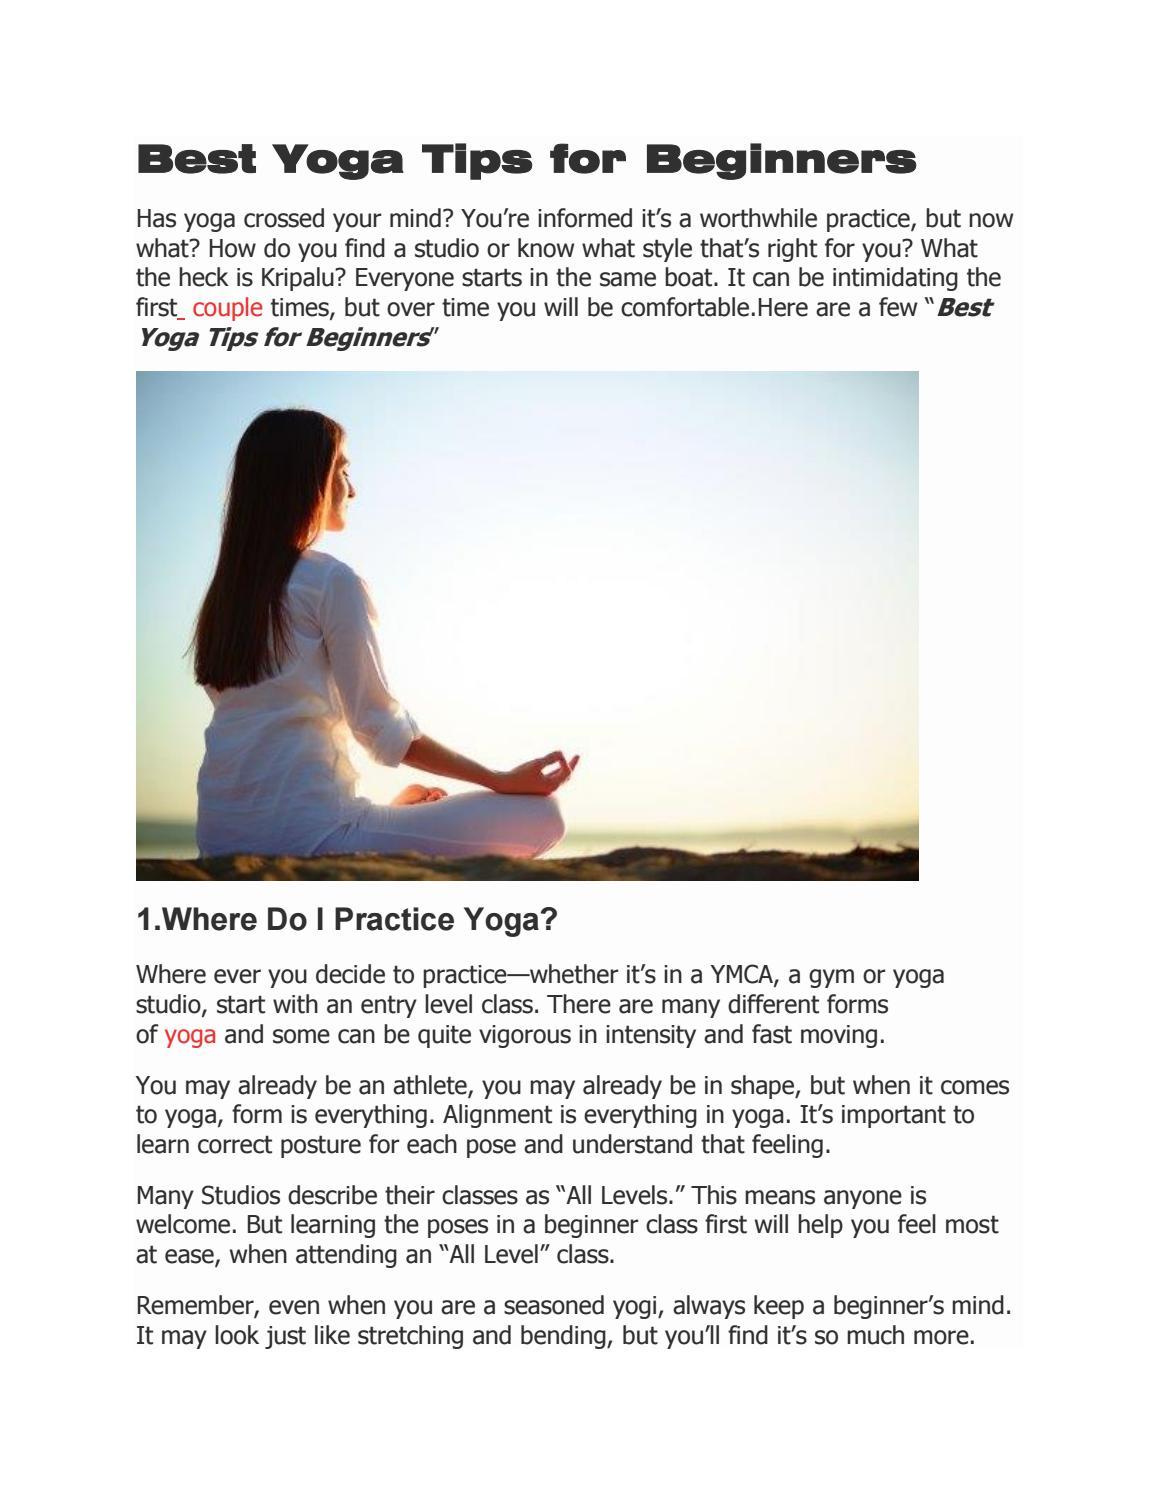 Best Yoga Tips For Beginners By Priya Mane Issuu